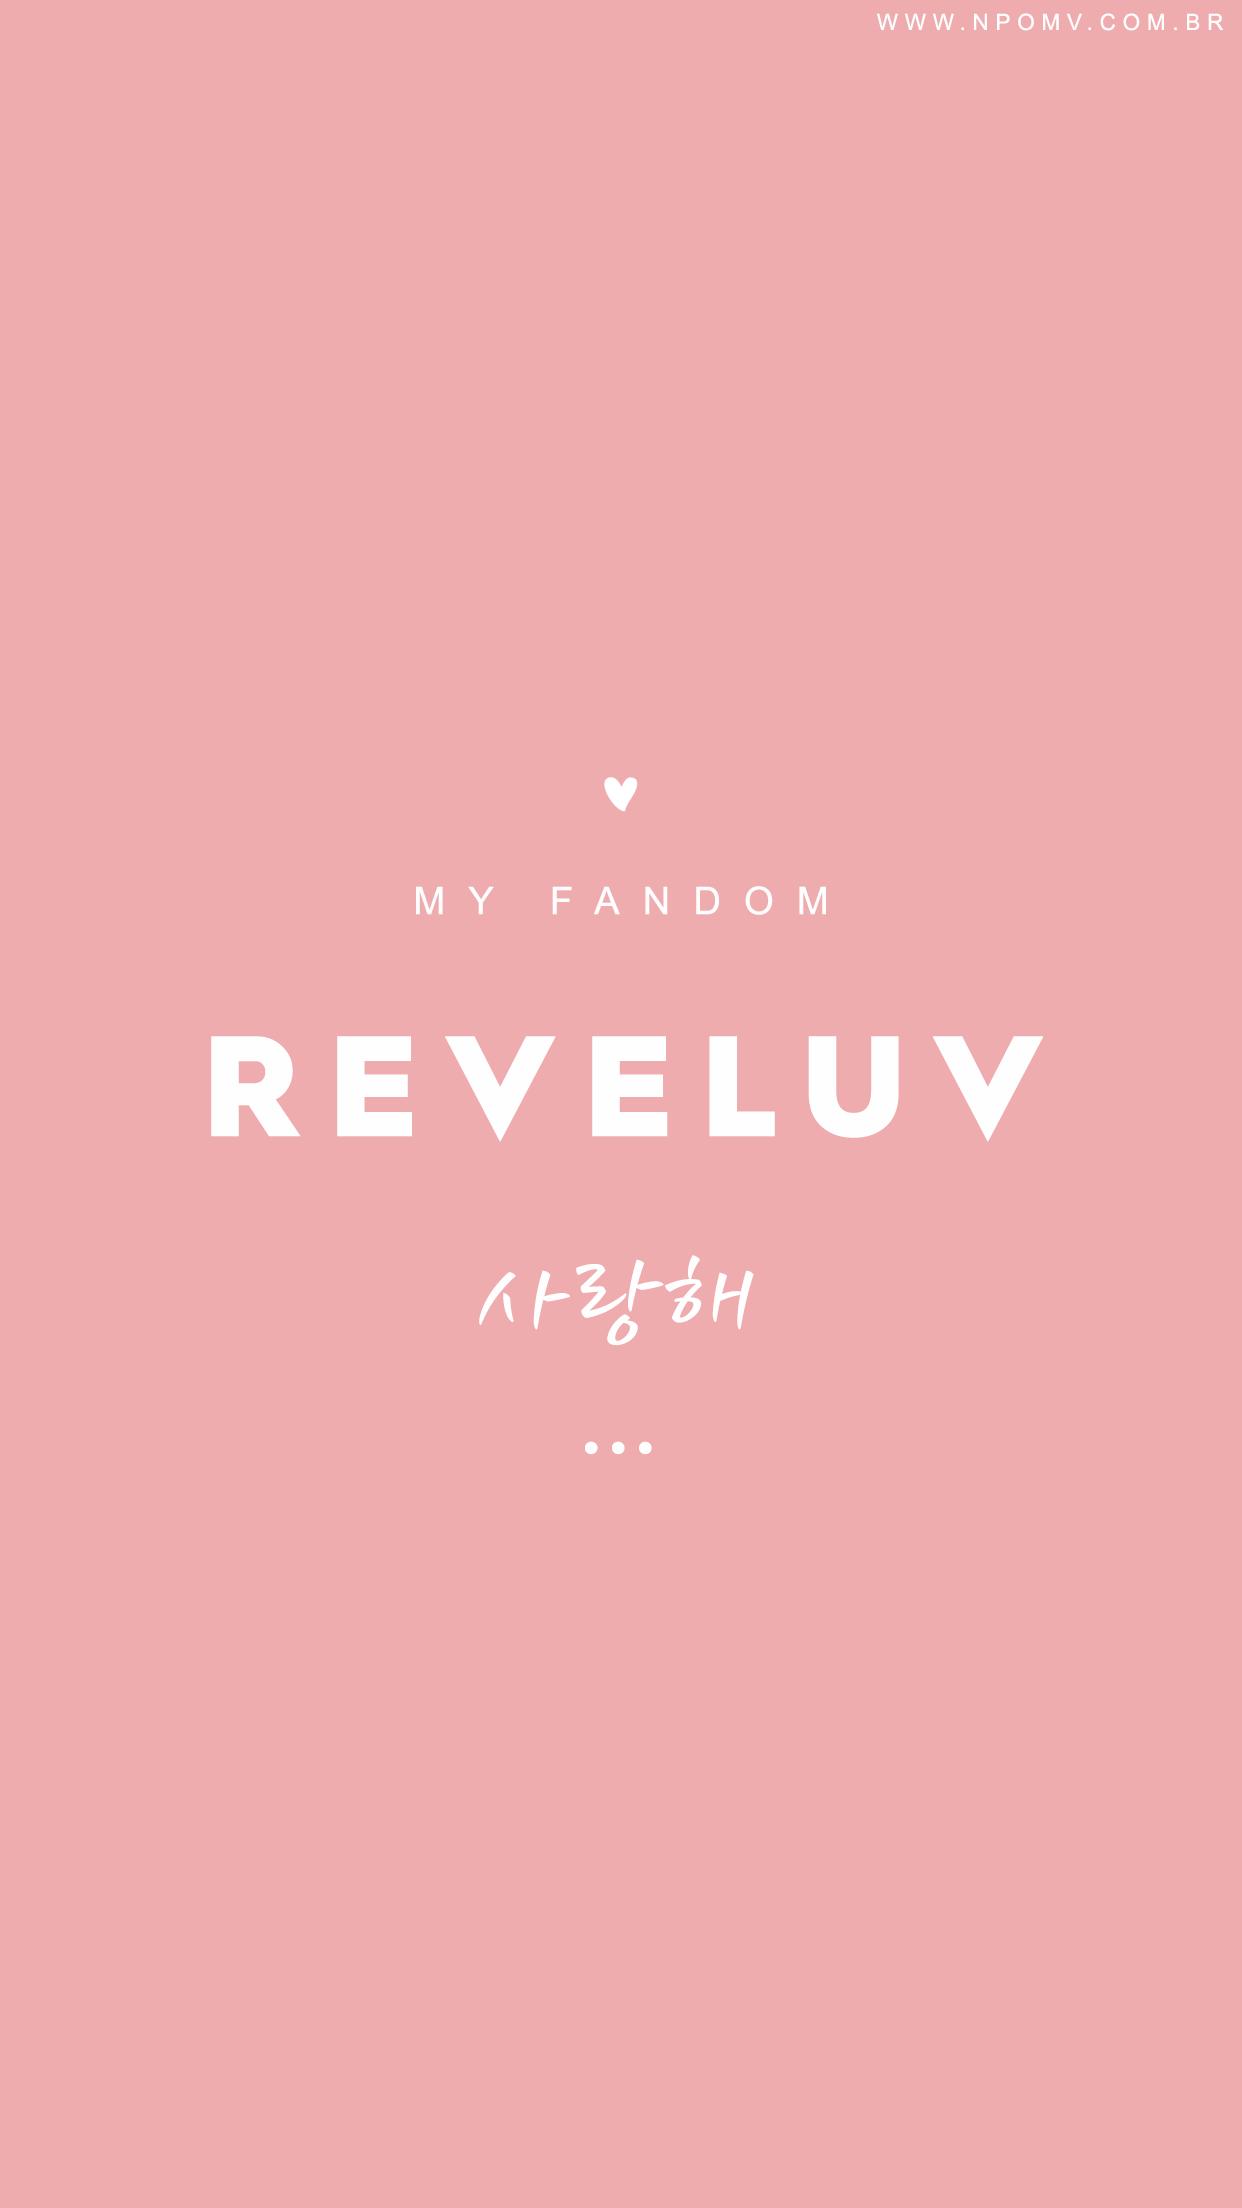 Wallpaper Red Velvet In 2019 Velvet Wallpaper Red Velvet